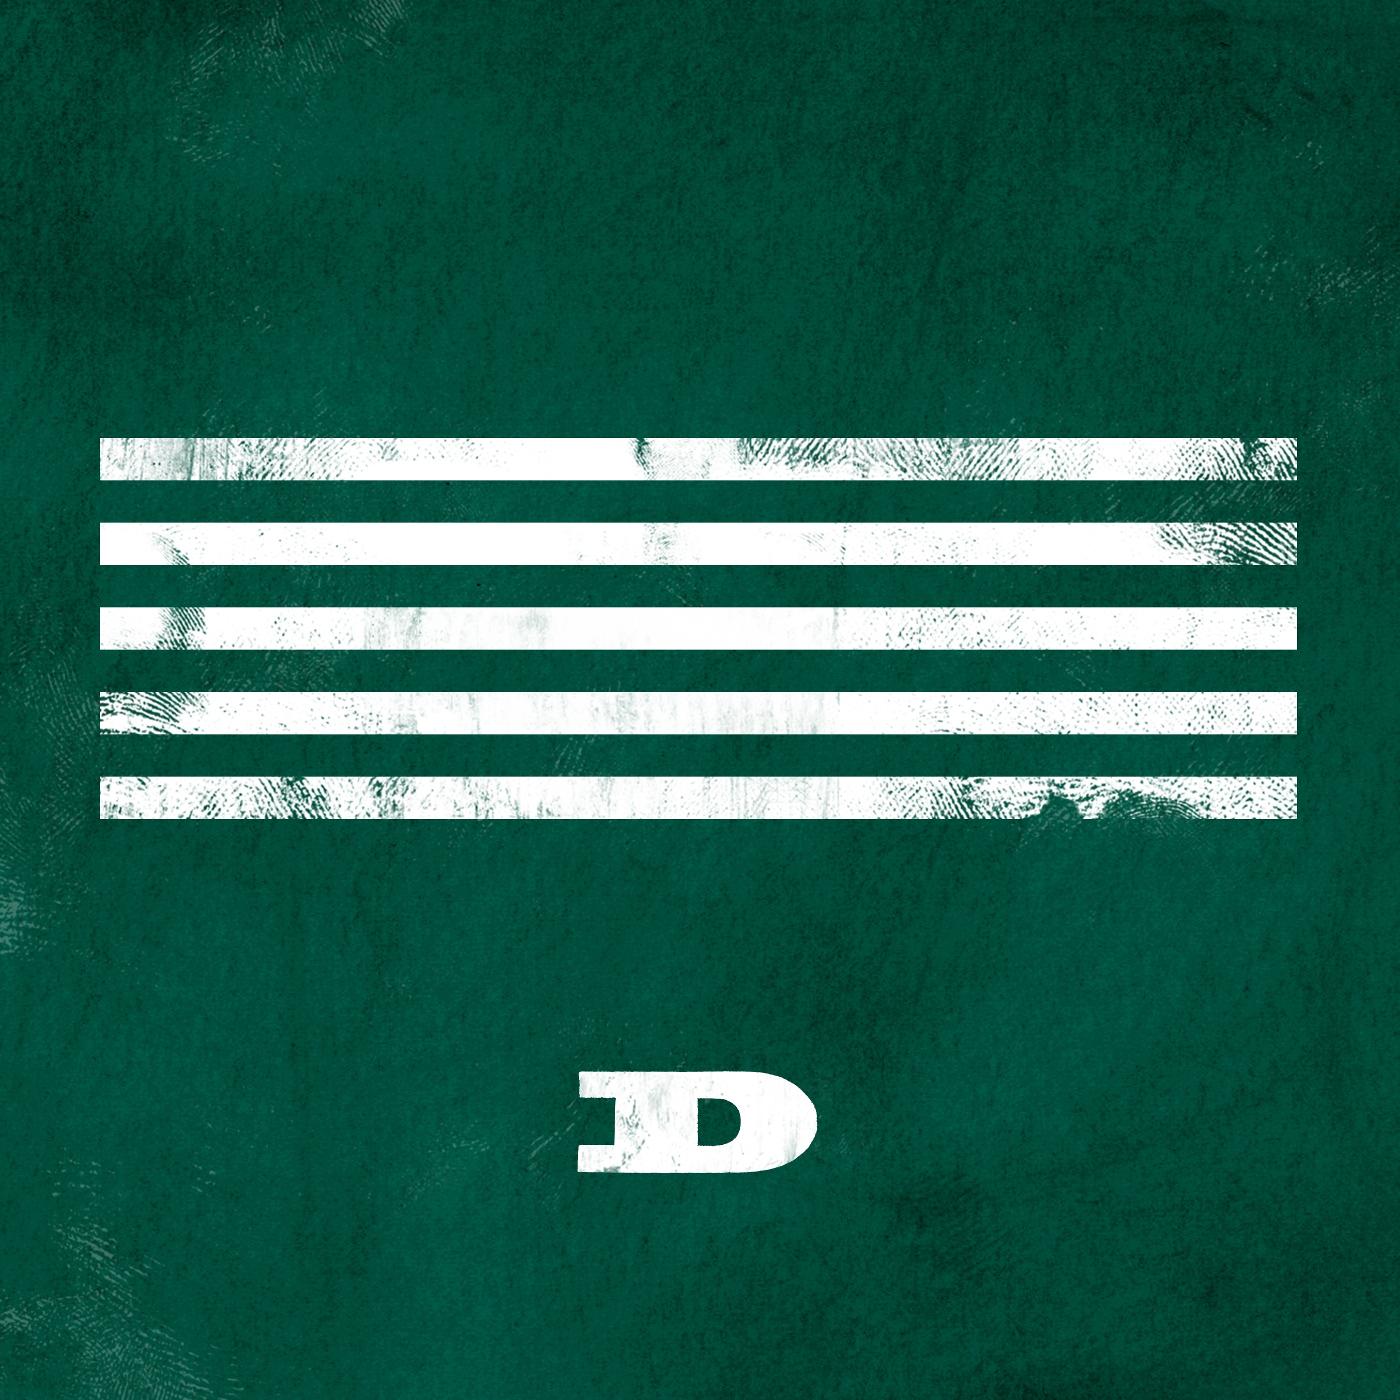 D (BIGBANG)